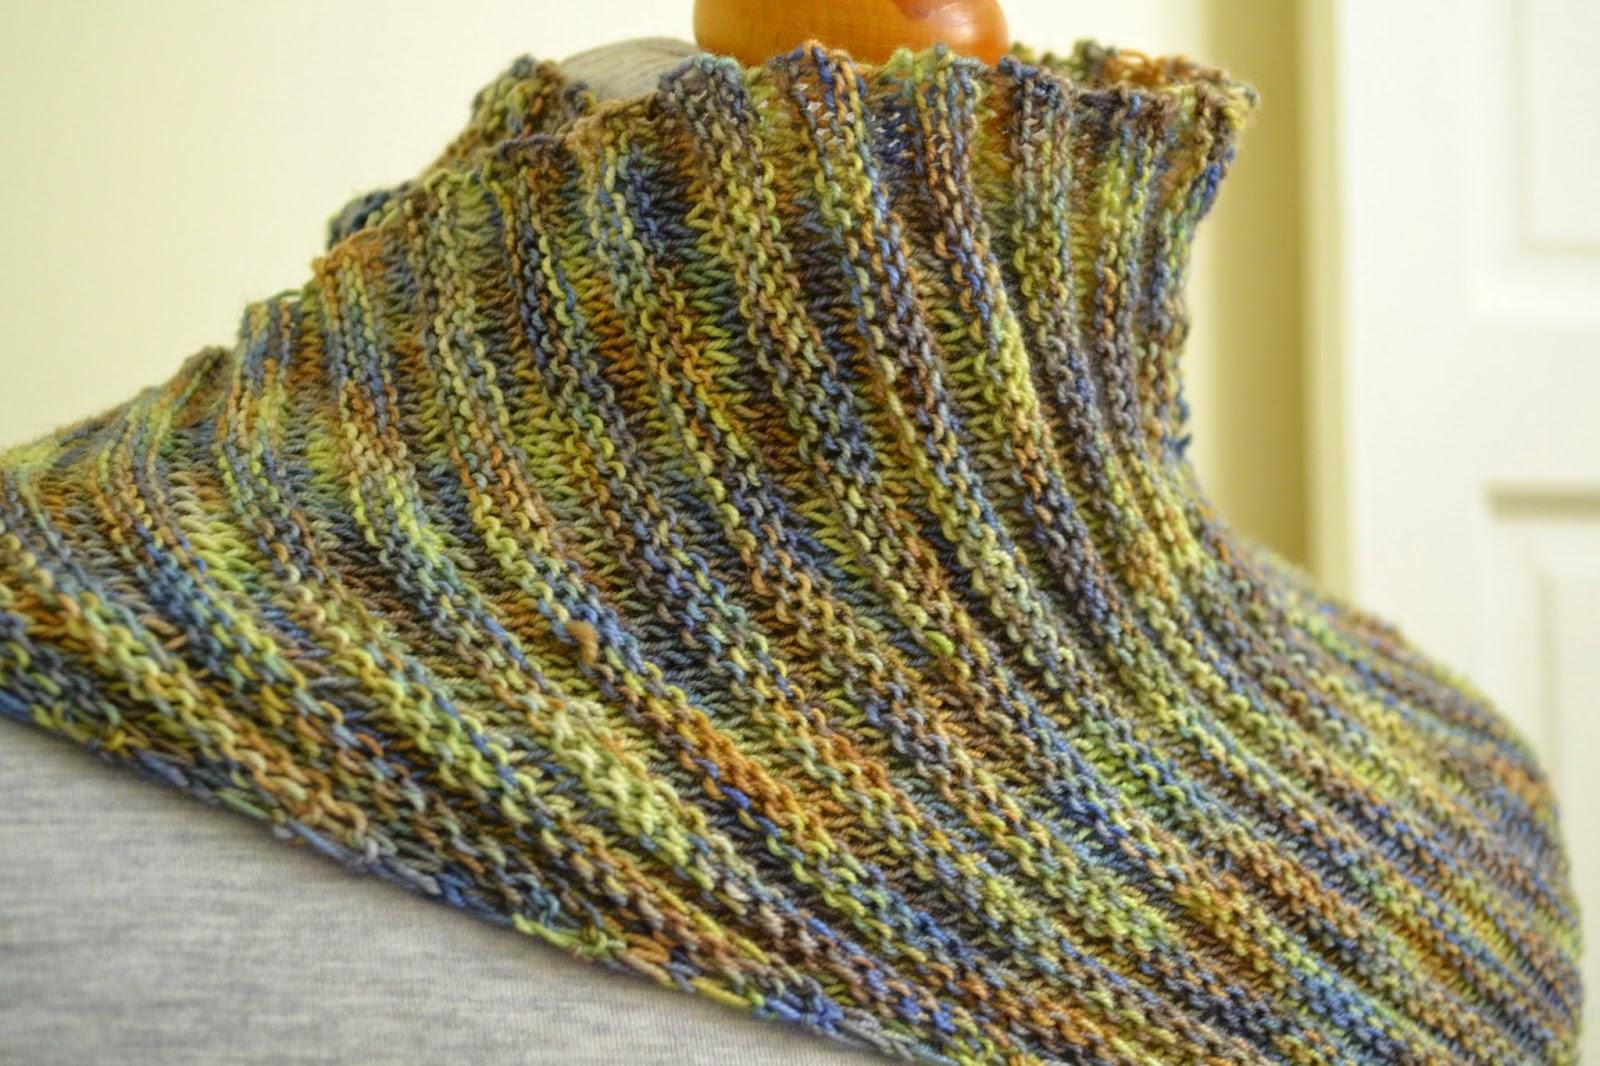 Decrease Knitting Garter Stitch : Knitting Novice: Cartridge Rib Stitch Baktus - Project Instructions